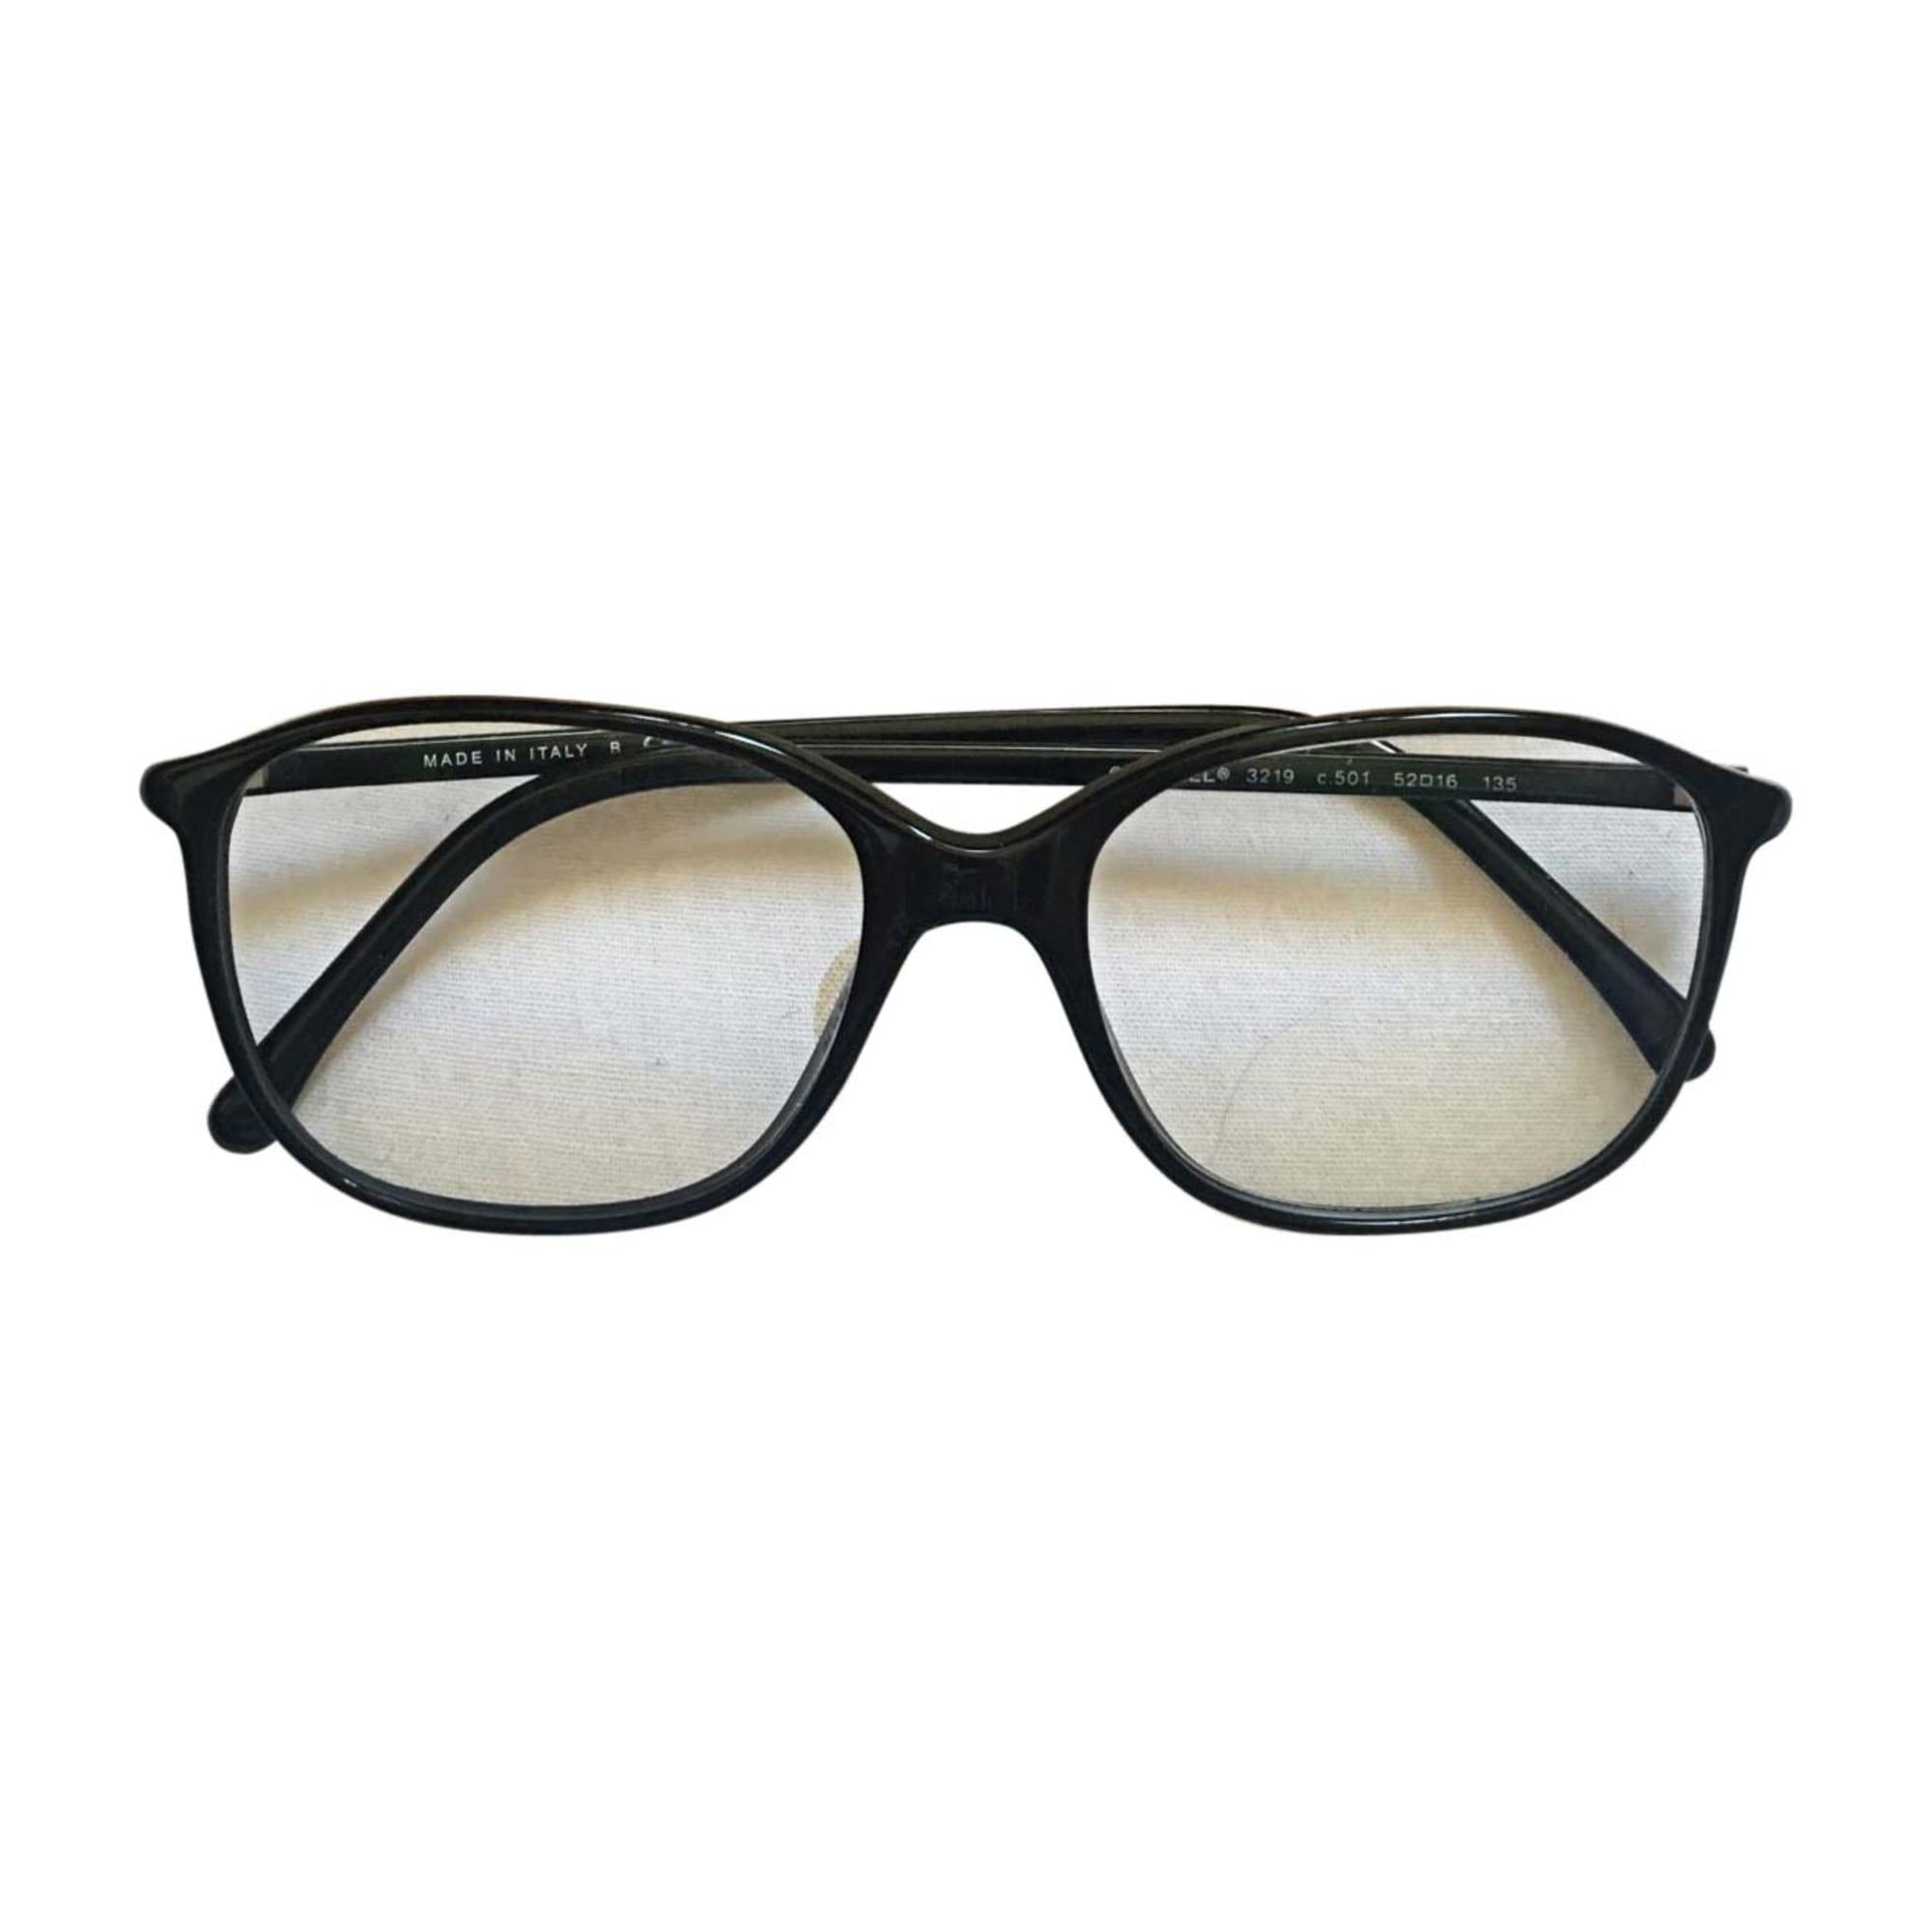 Eyeglass Frames CHANEL black vendu par Mberth - 7688321